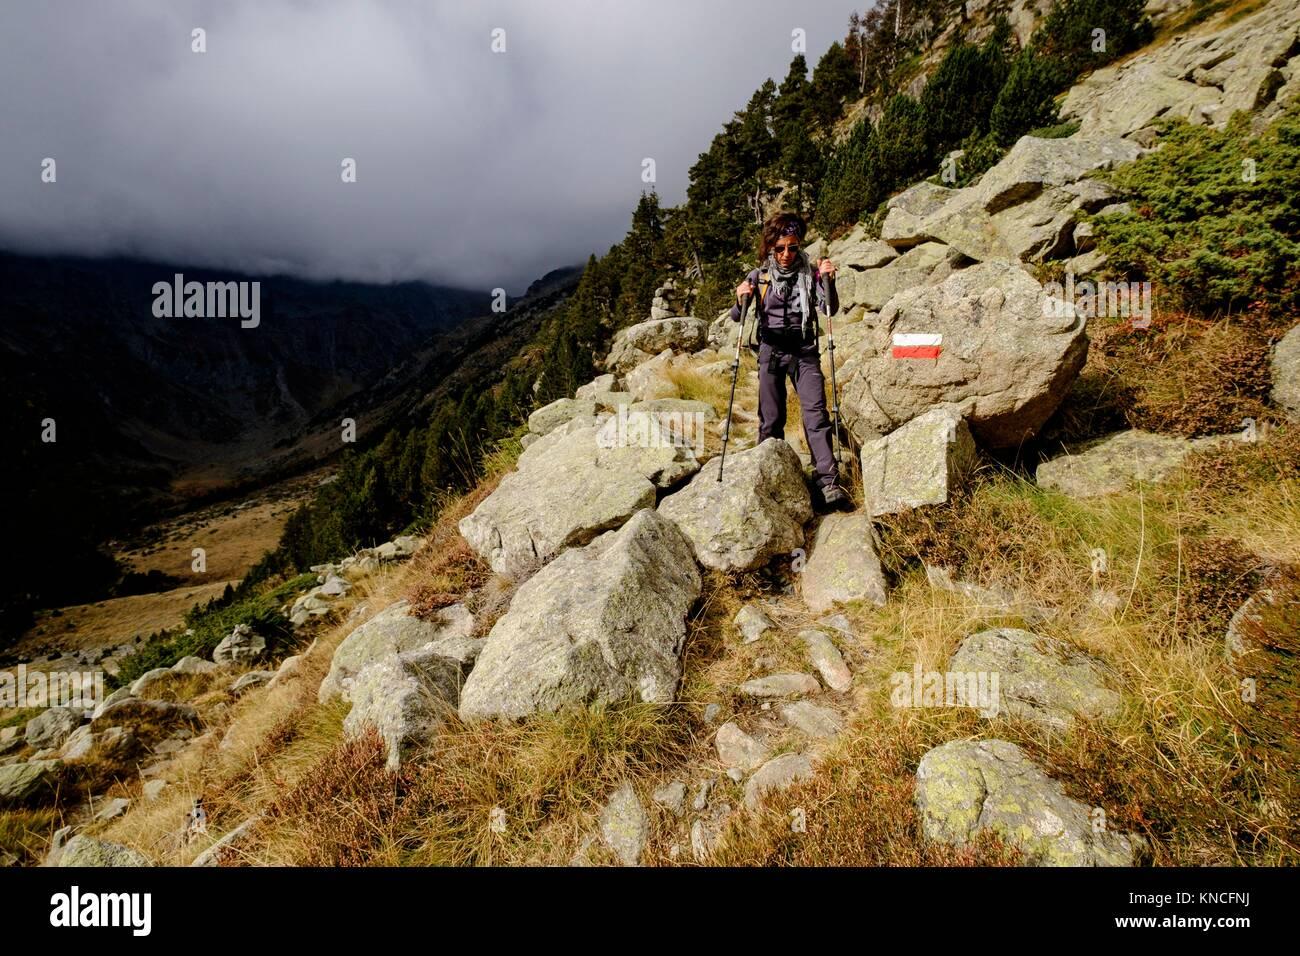 Trekker , Aran , Lleida province, Pyrenean mountain range, Catalonia , Spain - Stock Image